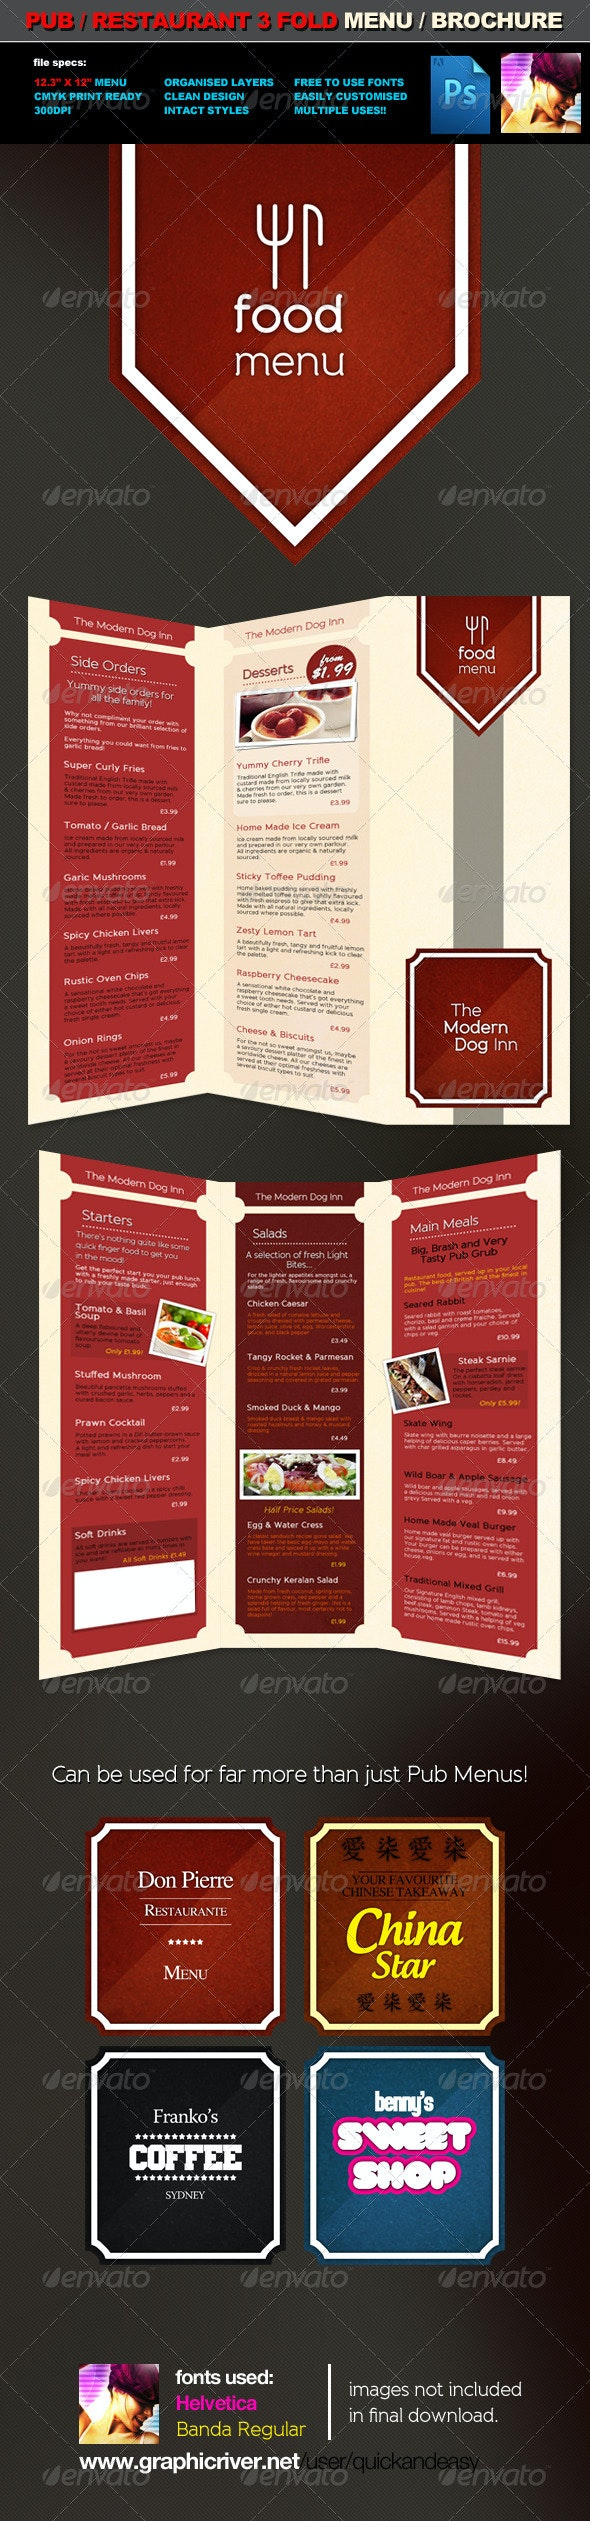 3 Fold Pub Food Menu / Brochure Template - Food Menus Print Templates